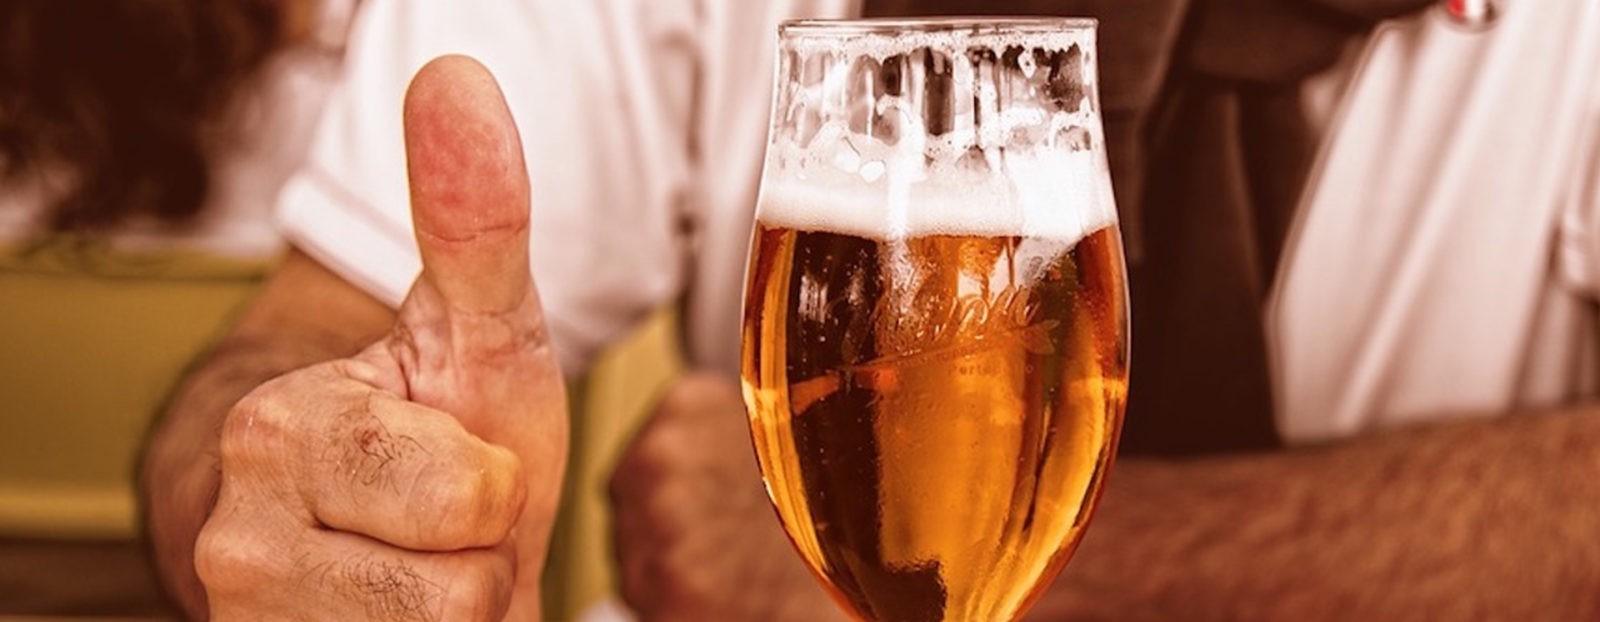 stadtfuehrung-wernigerode stadtfuehrer stadtfuehrungen Bier